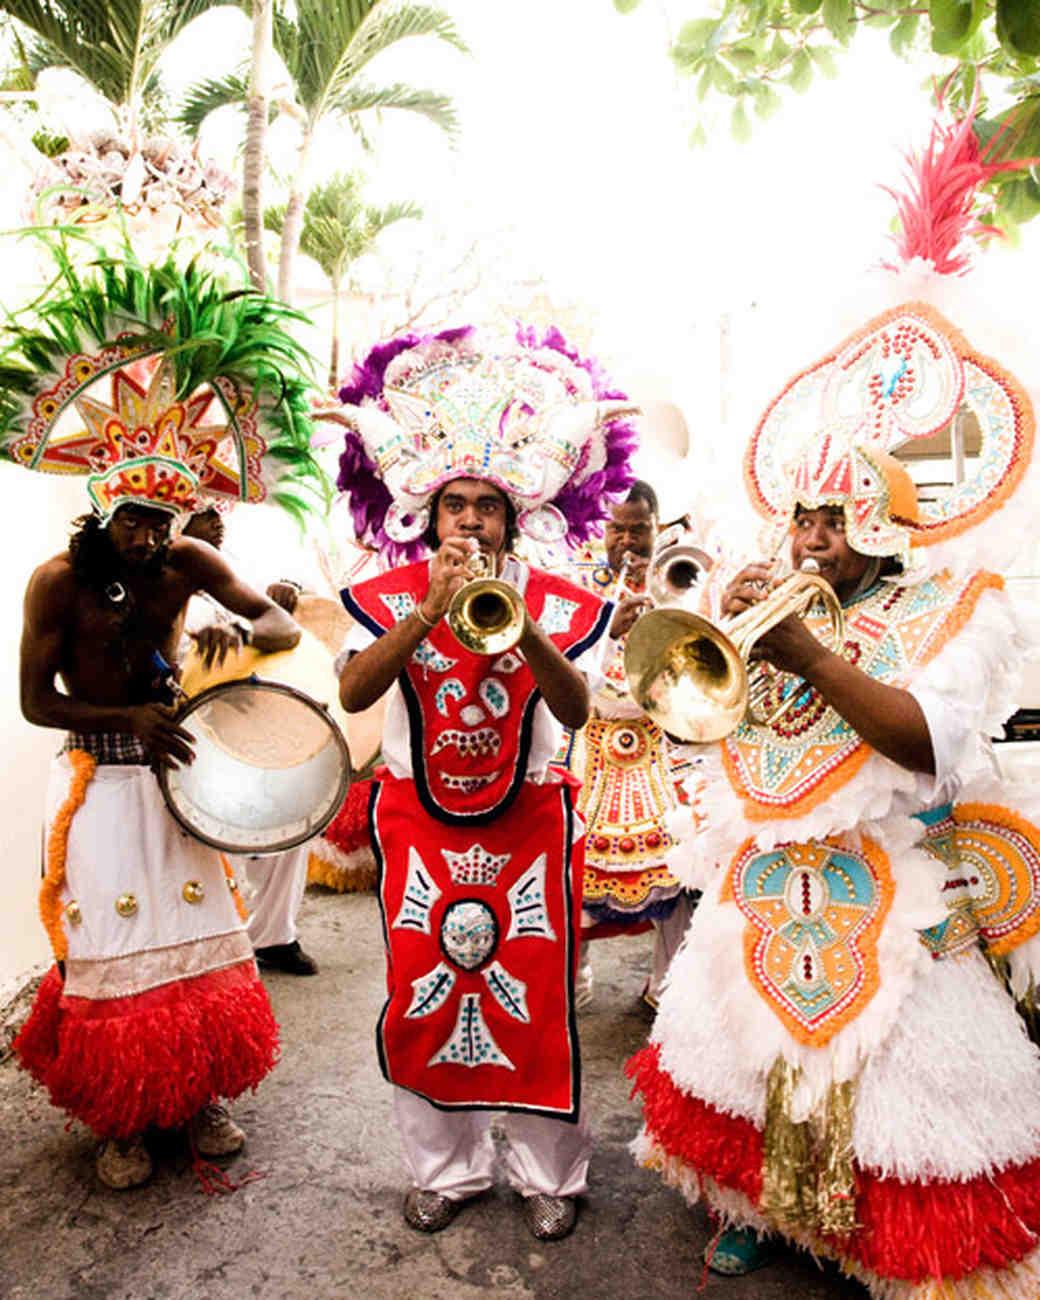 msw_travel09_musicians_bahamas.jpg